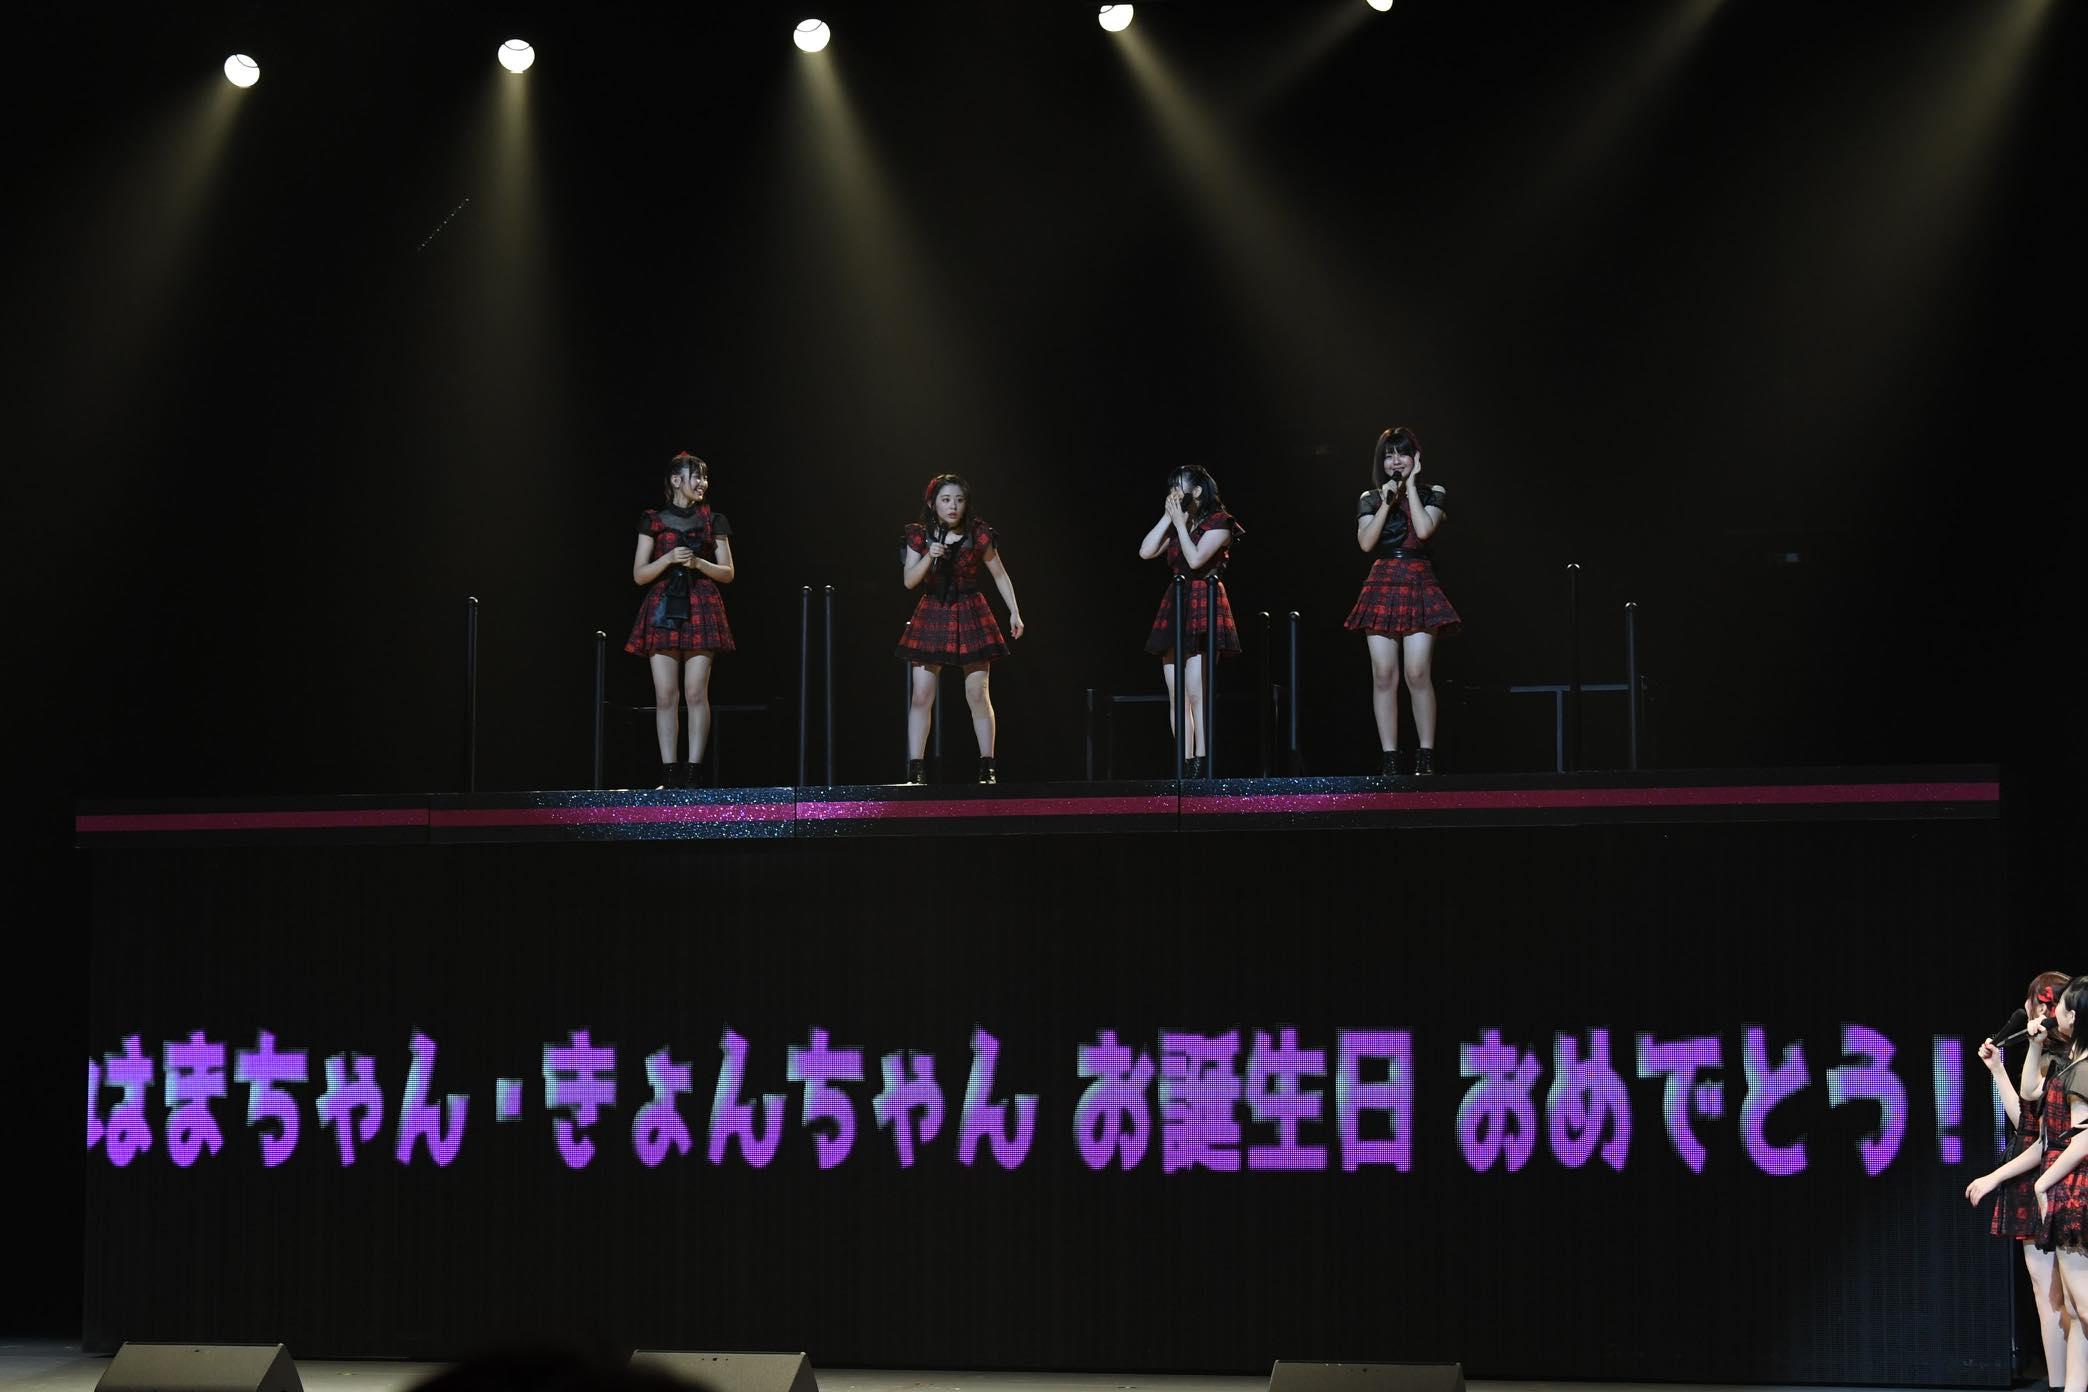 AKB48全国ツアー「神奈川公演」開催、チームBとチーム4のパワーが炸裂!【写真17枚】の画像013